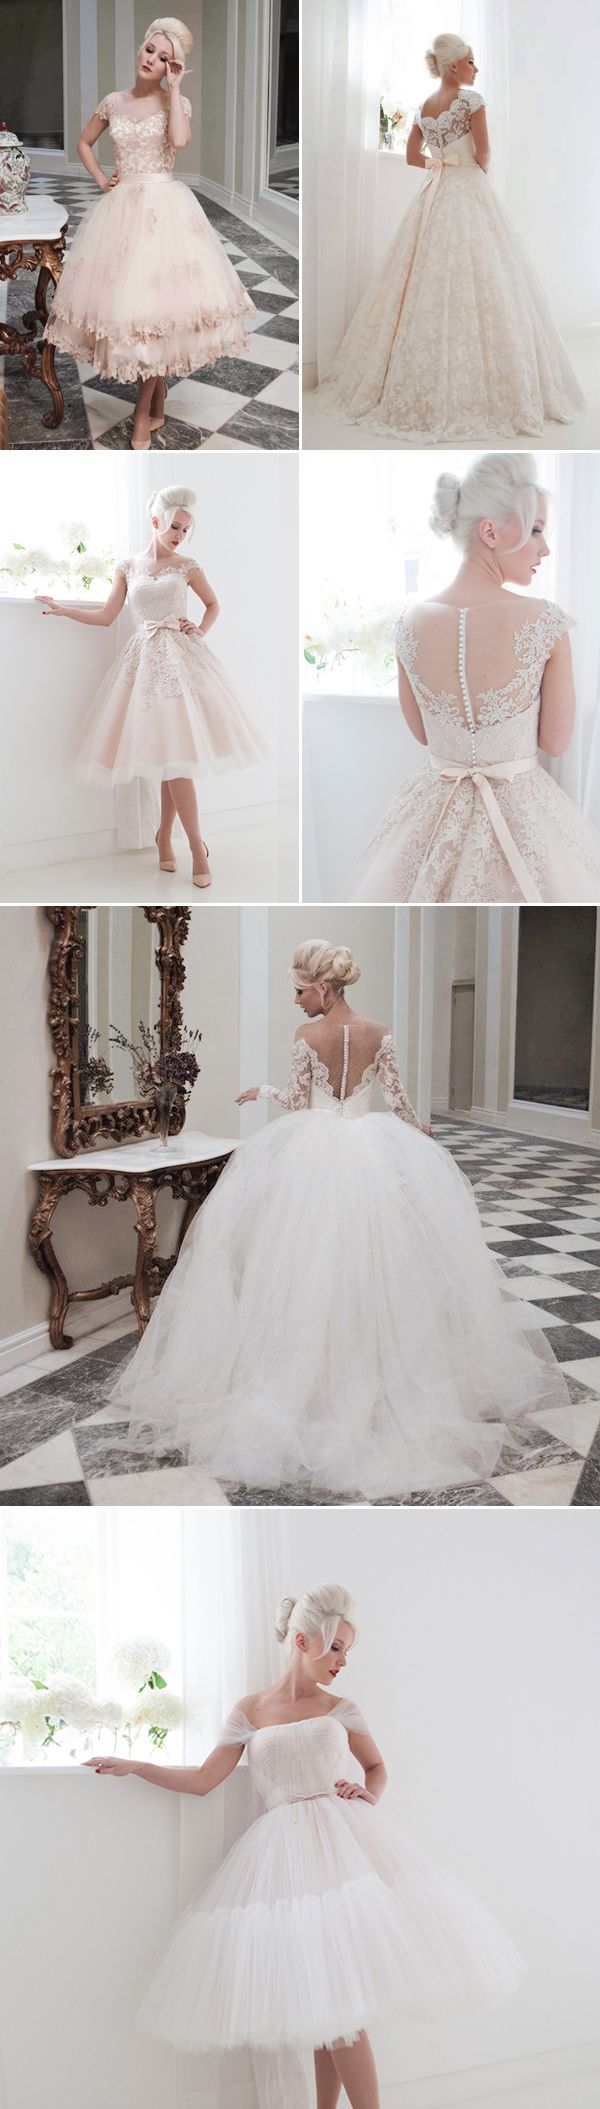 48 Prettiest Vintage Wedding Dresses You Will Love!